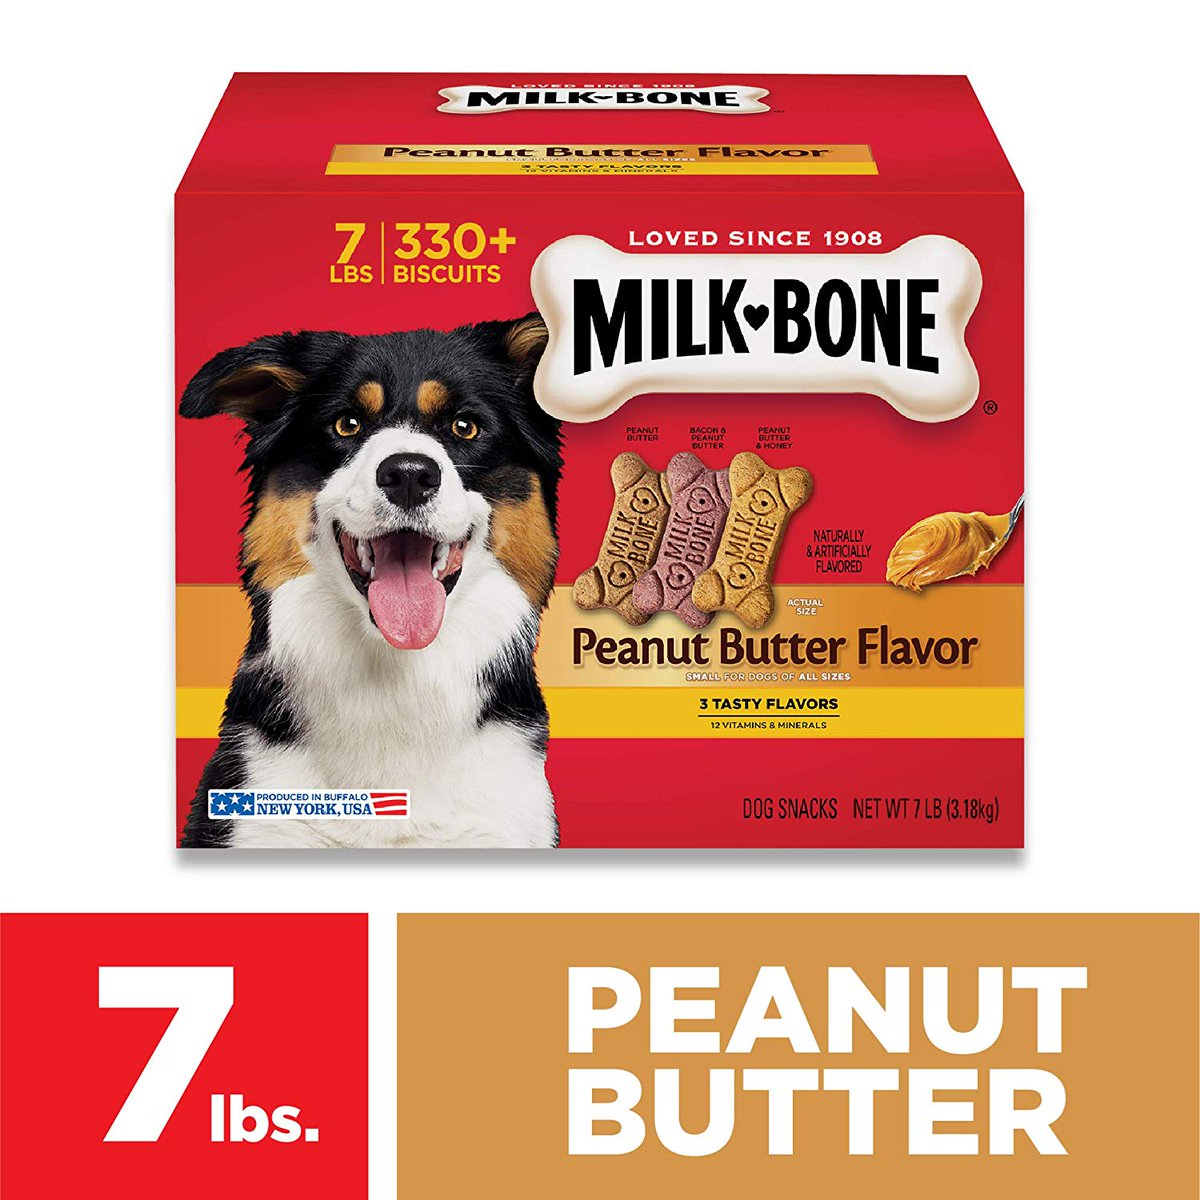 50% off!!!  7lbs of MilkBones!!!    #BwcDeals #Deals #dailydeals #MilkBone #Pets